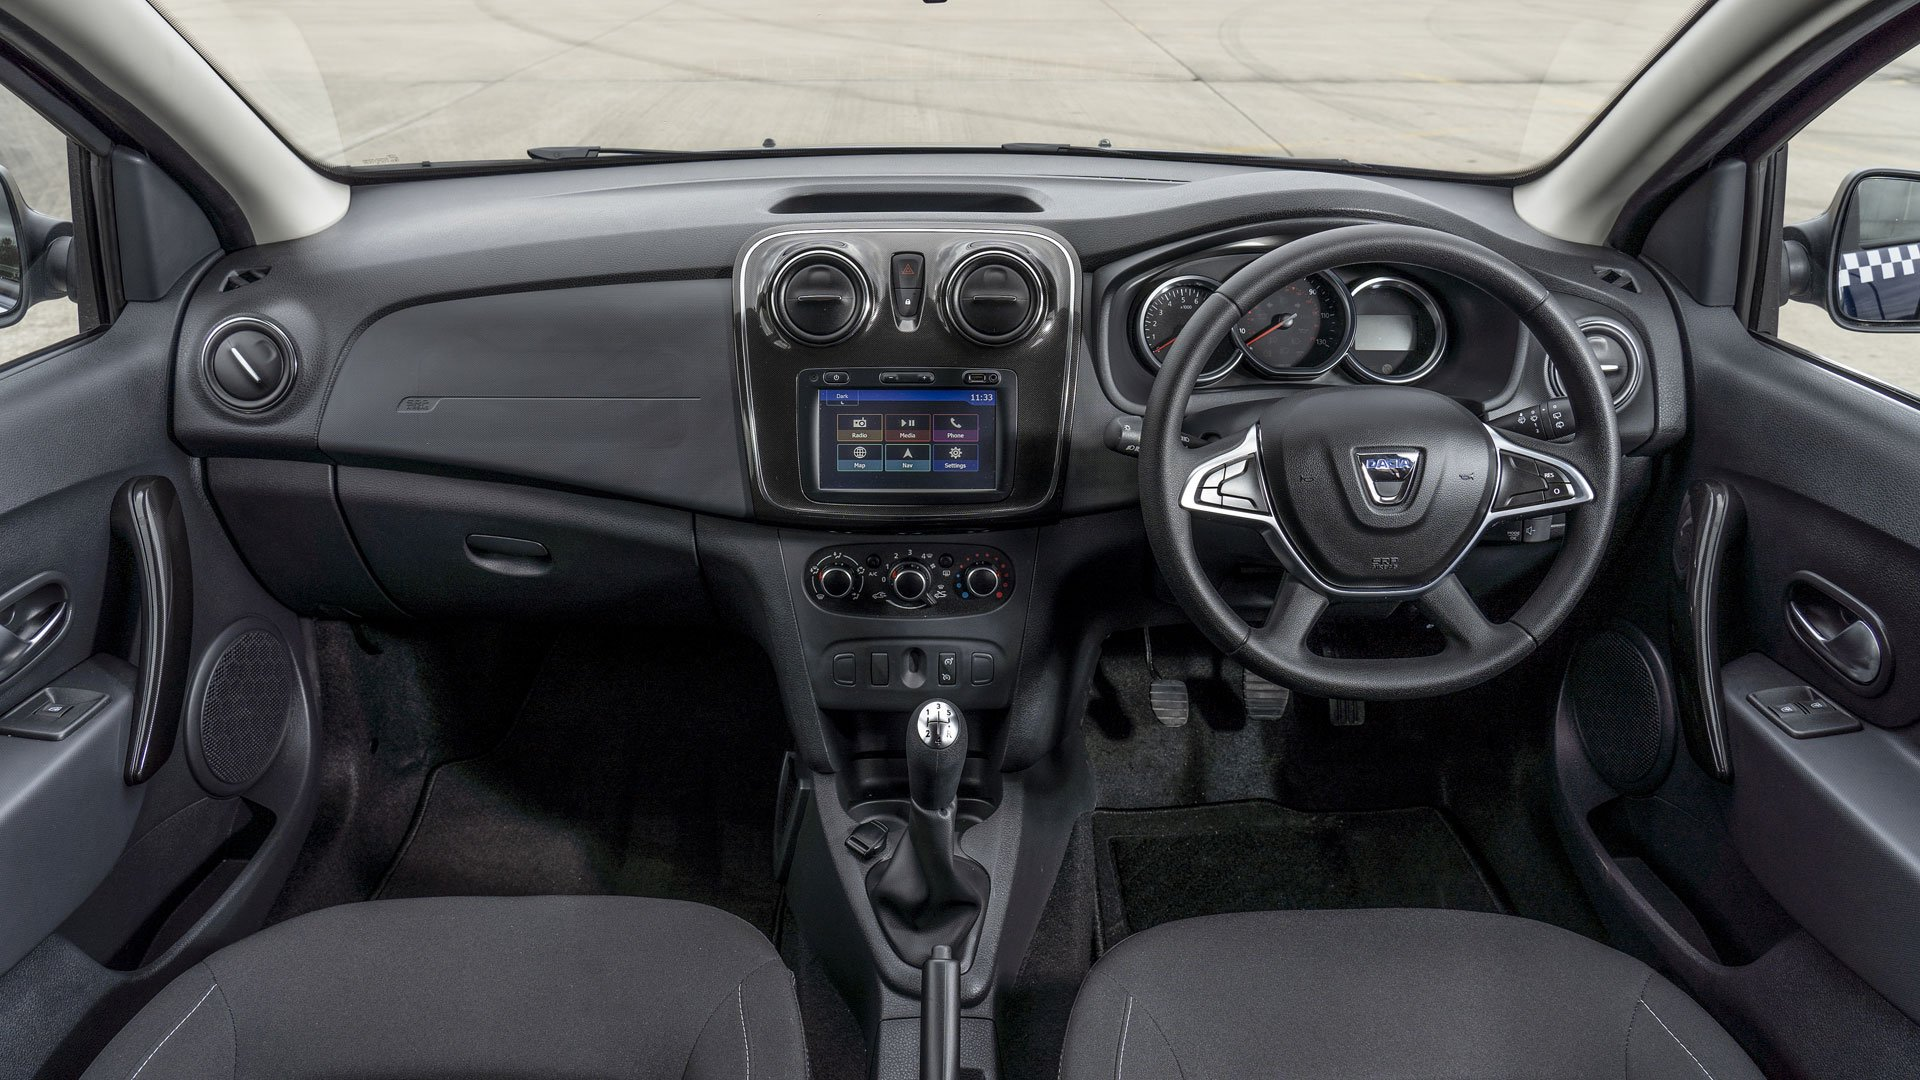 Dacia-Logan-MCV-taxi-cabin